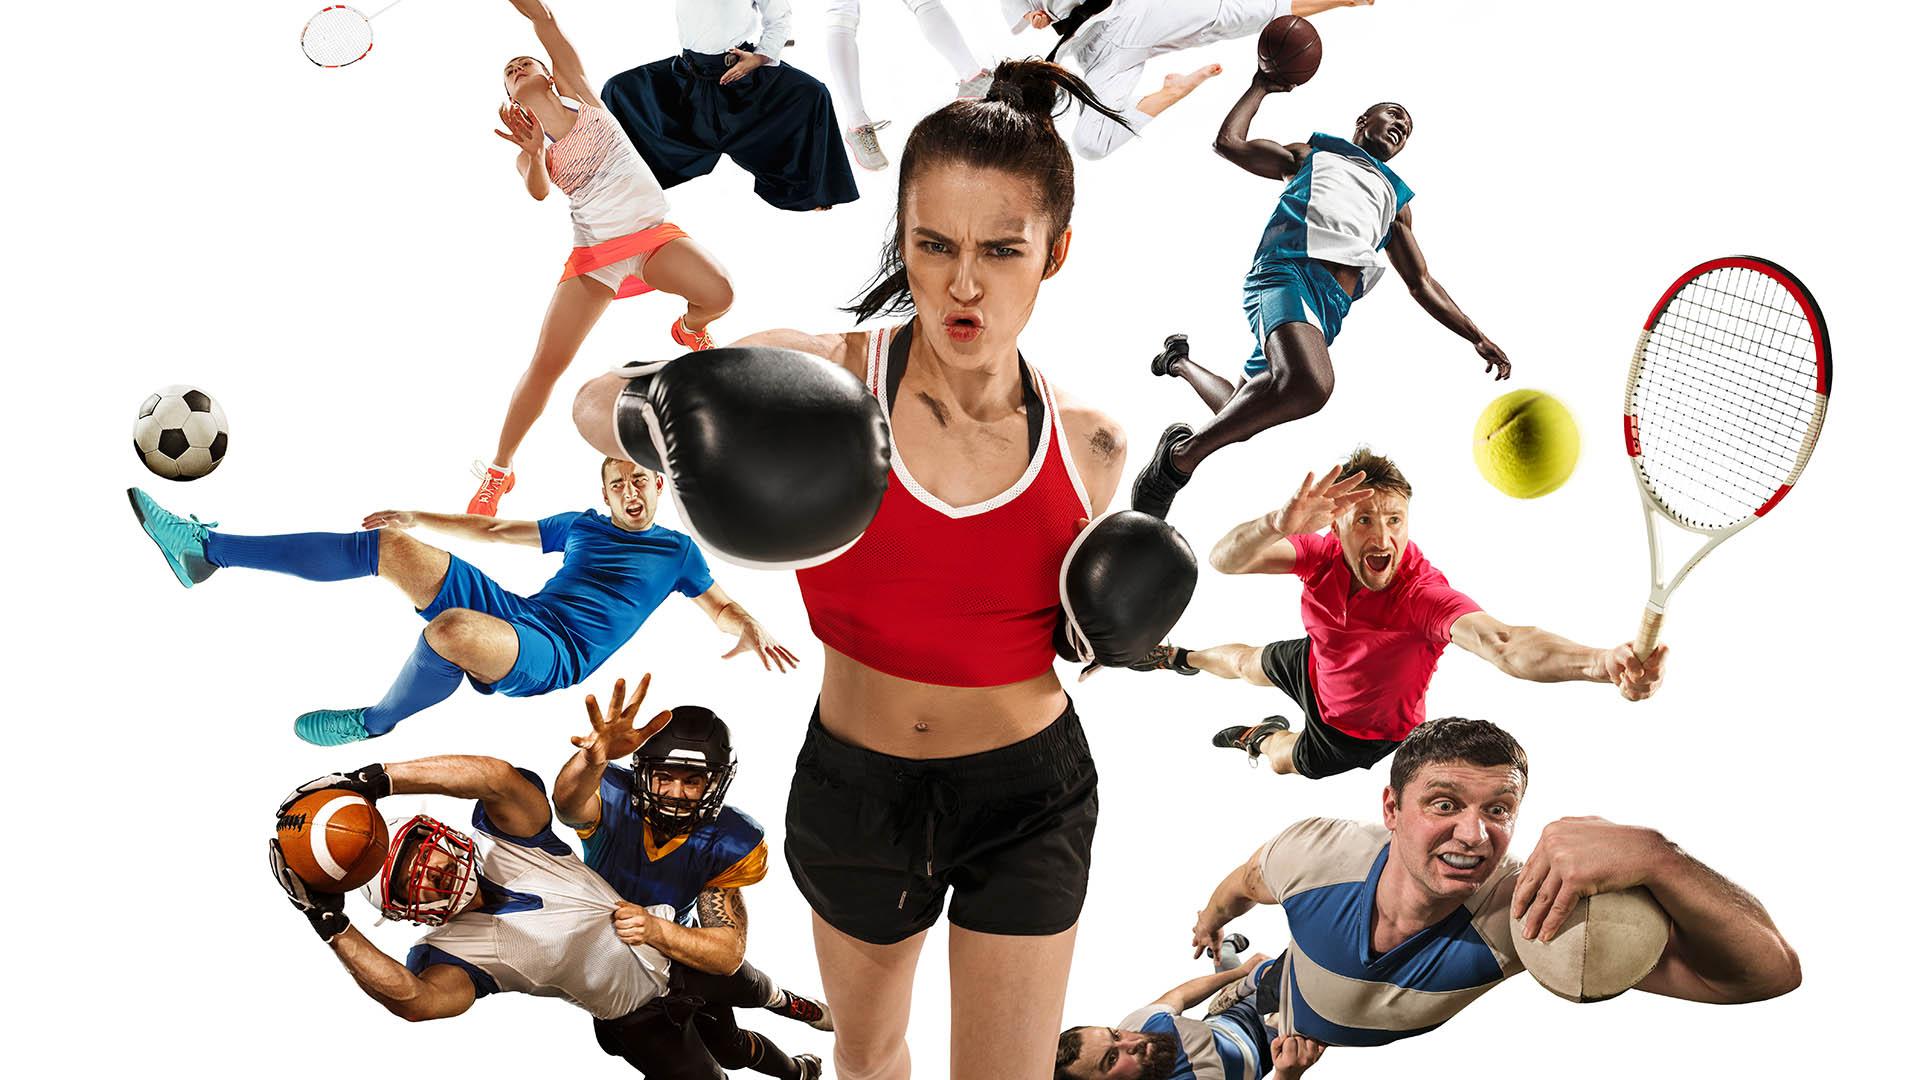 Fisioterapia sport Appia Tuscolana